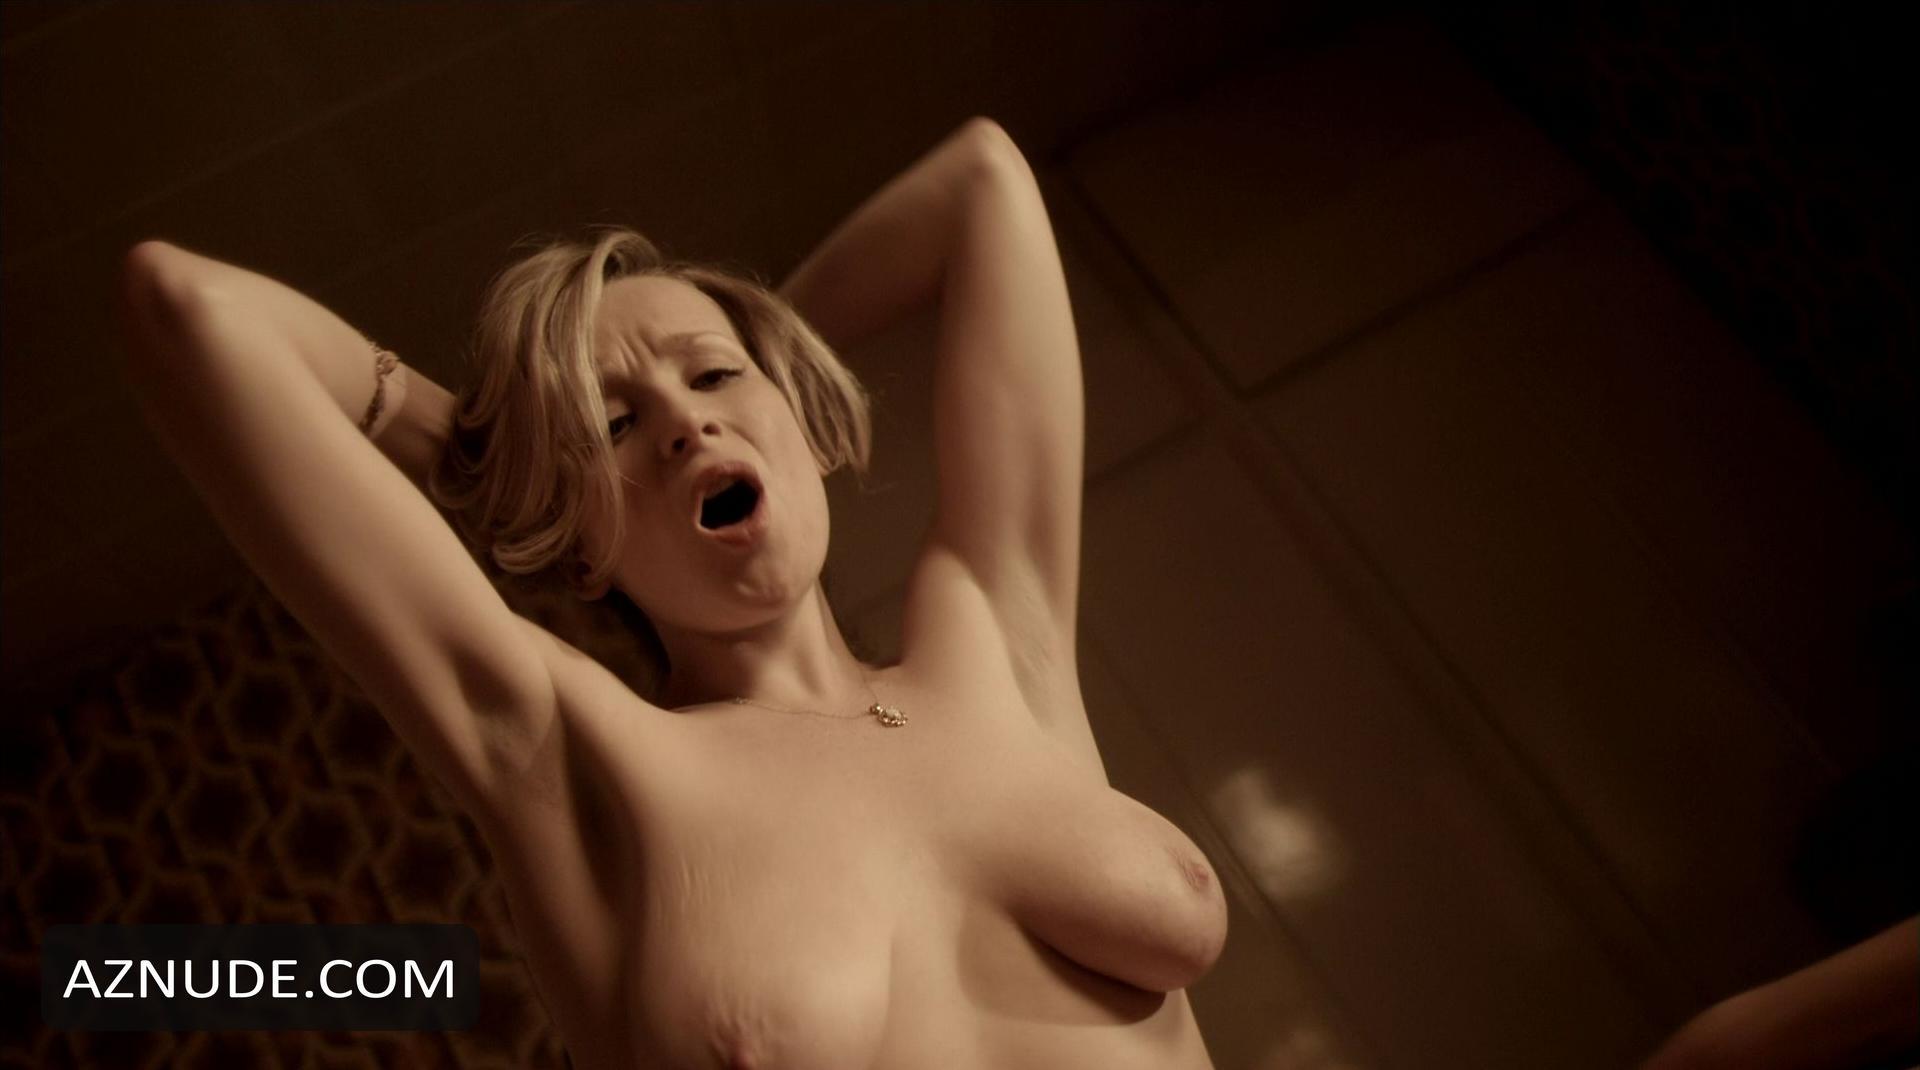 Amy Brenneman Nude Pics amy brenneman nude 3 amy brenneman nude 4 amy brenneman